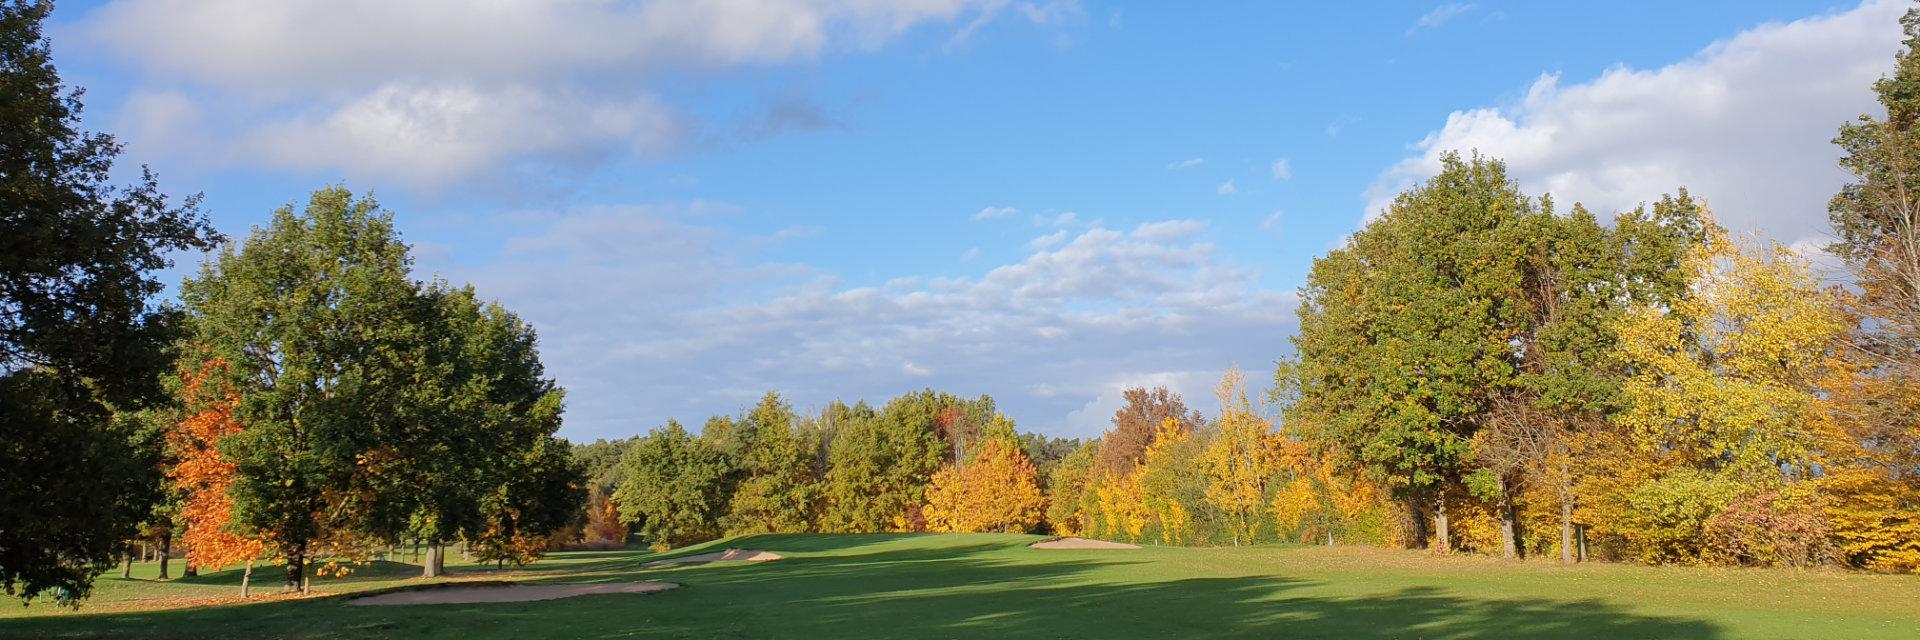 Golfplatz_Herbst_2020_1Slider